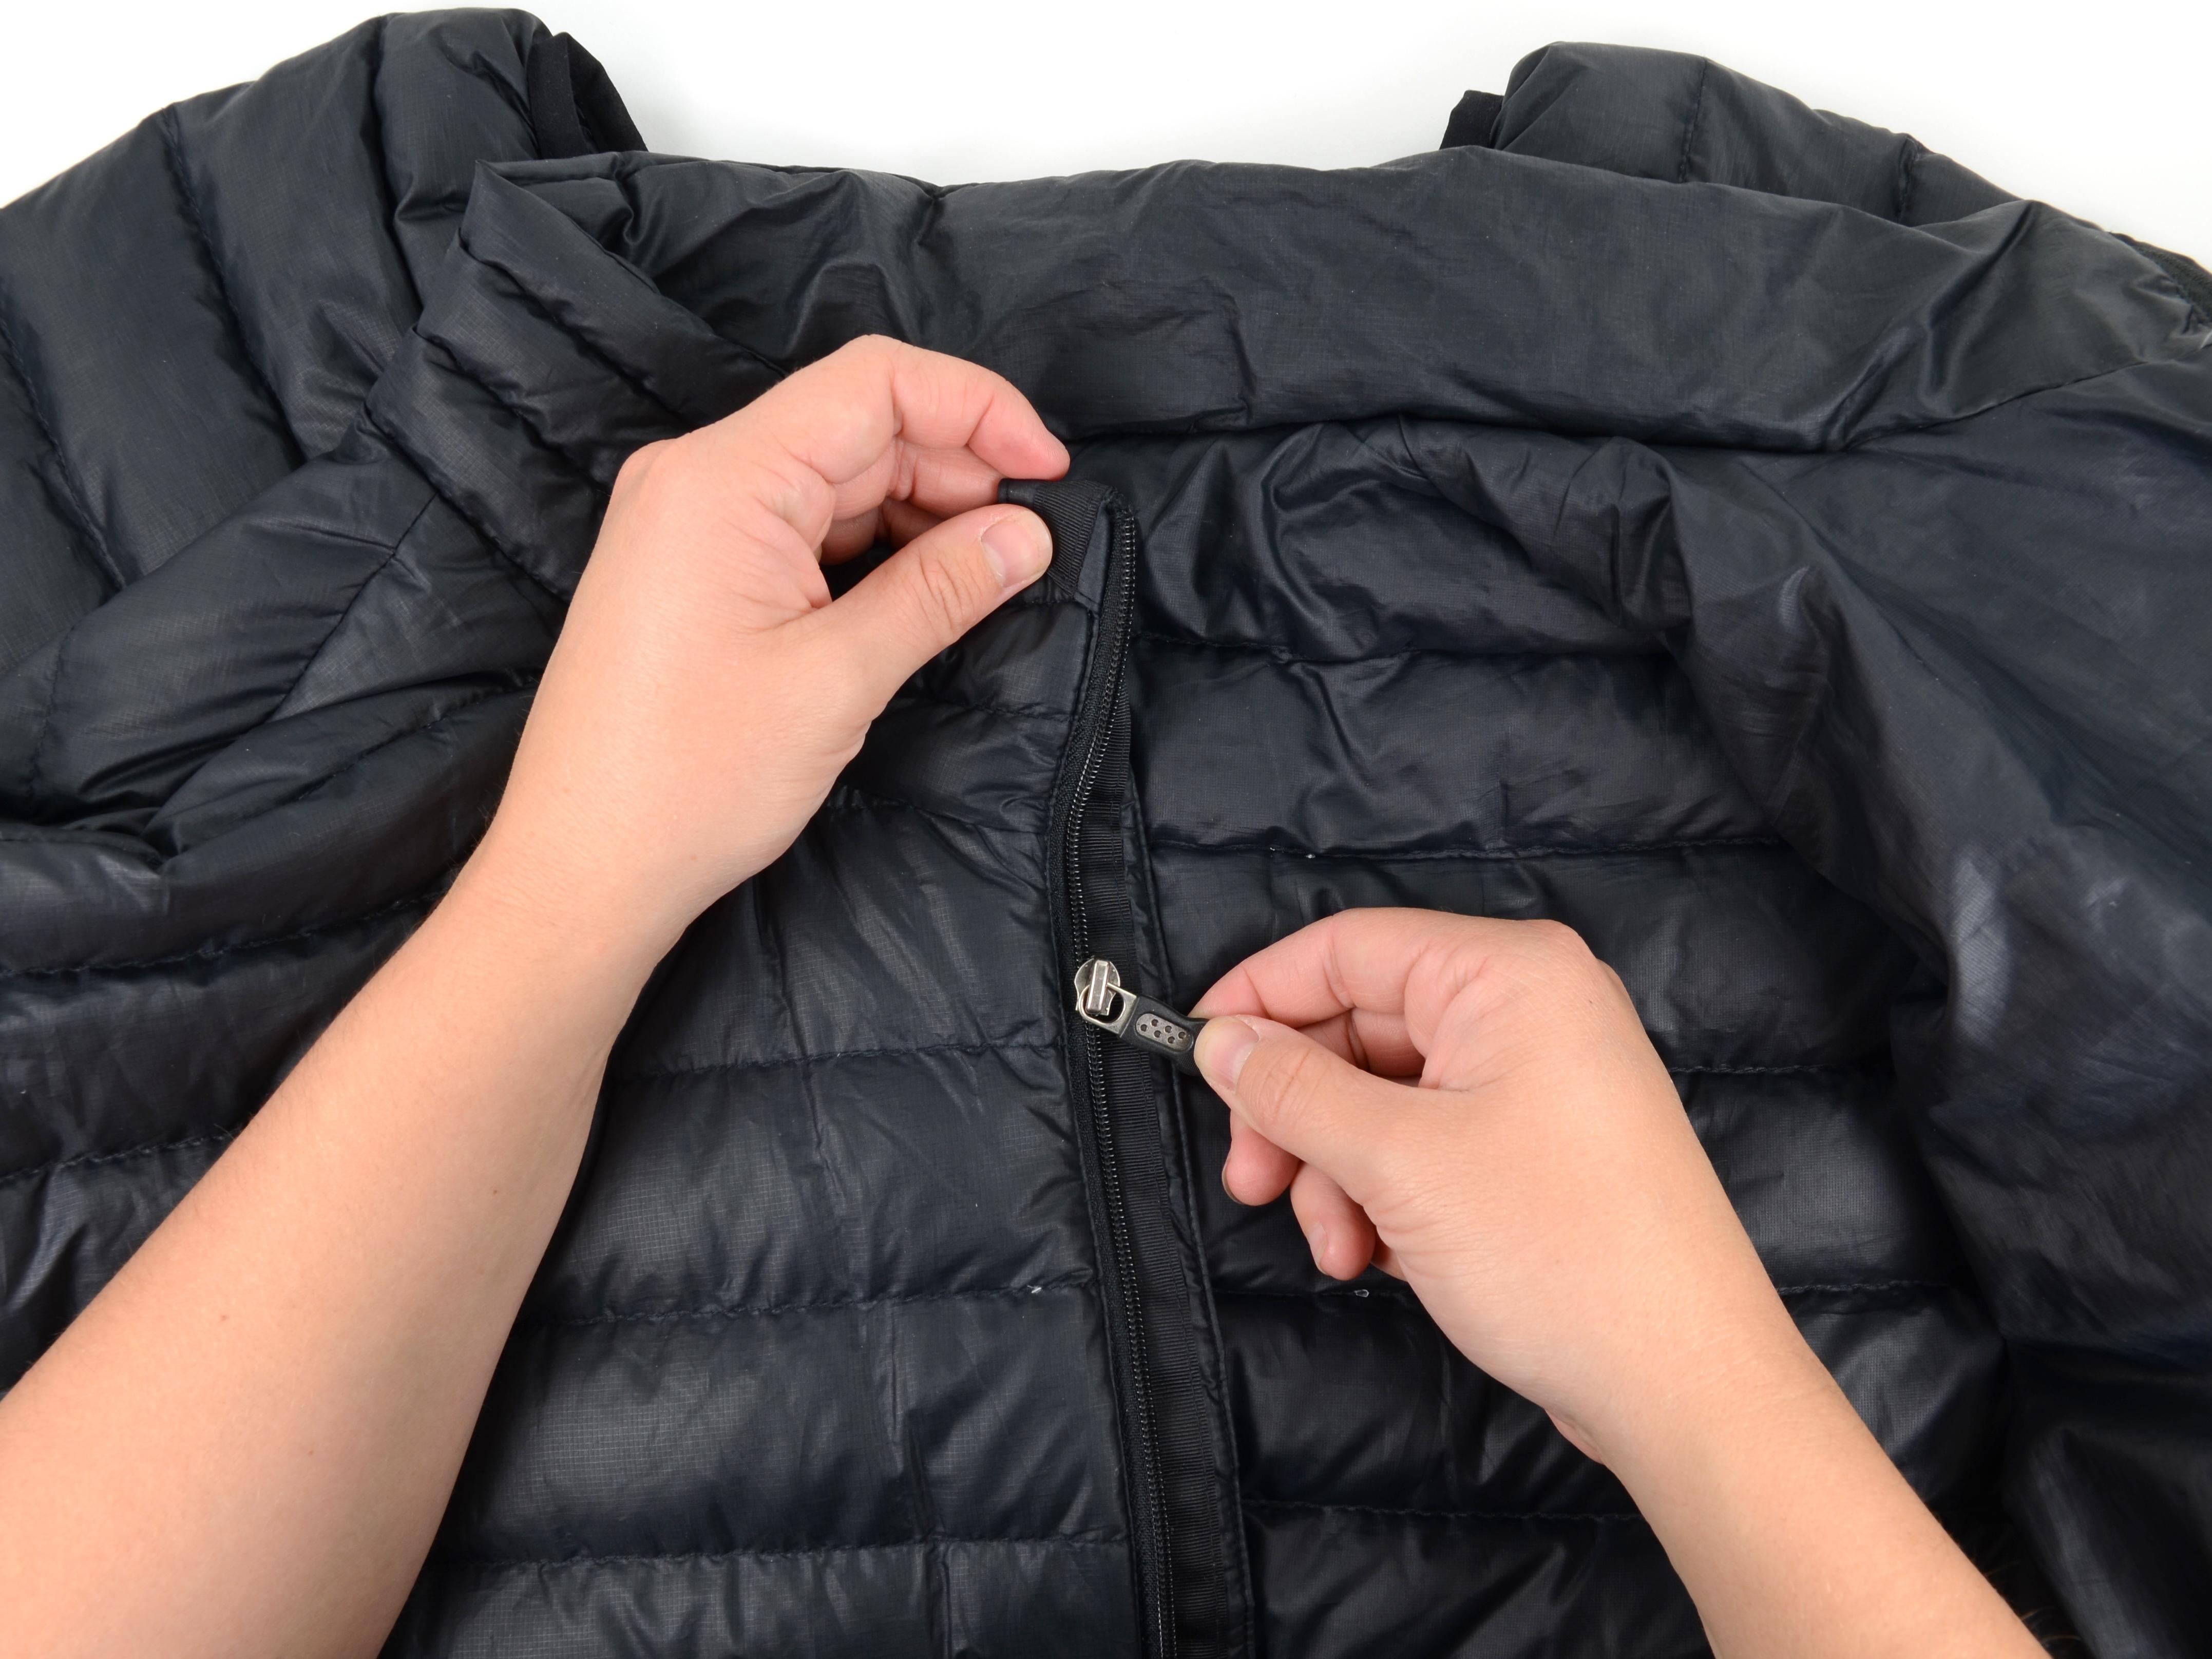 Leather jacket zip repair - Coil Zipper Slider